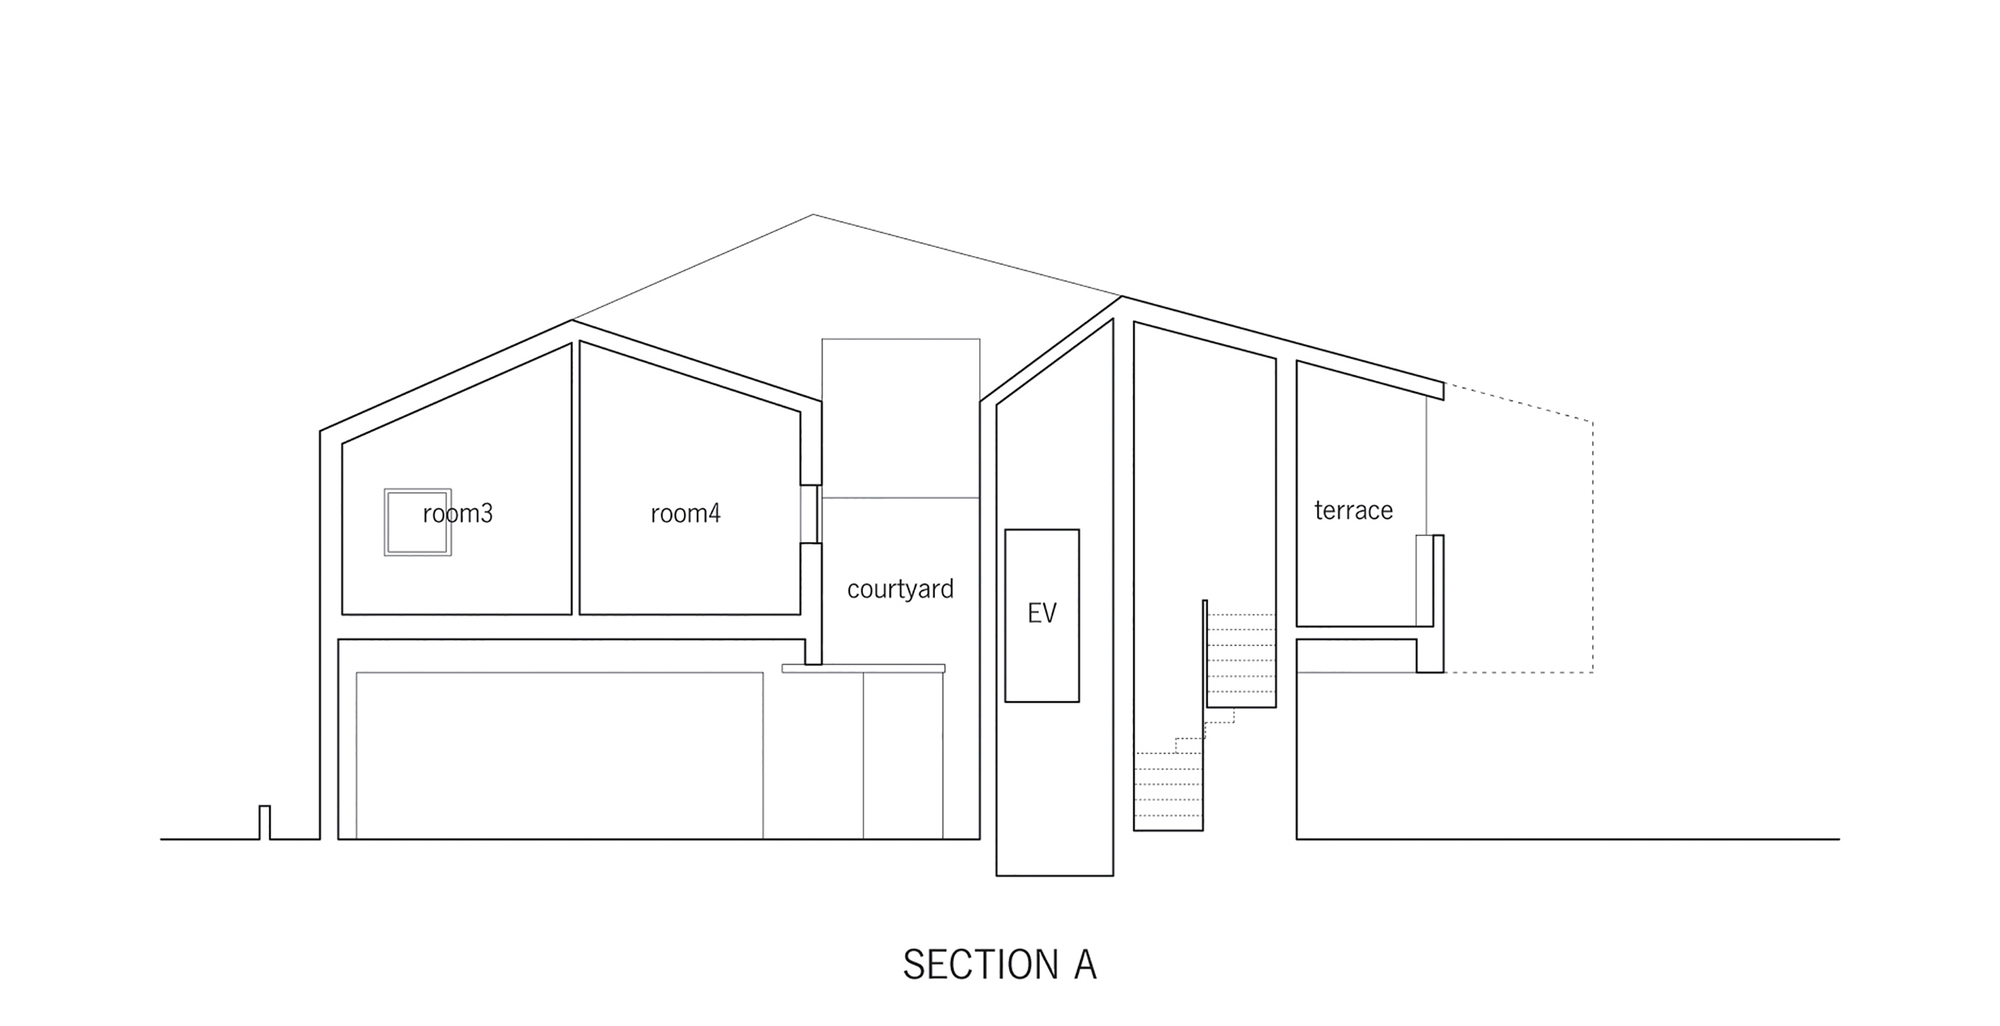 Sección B de Casa en Kitaoji de Torafu Architects